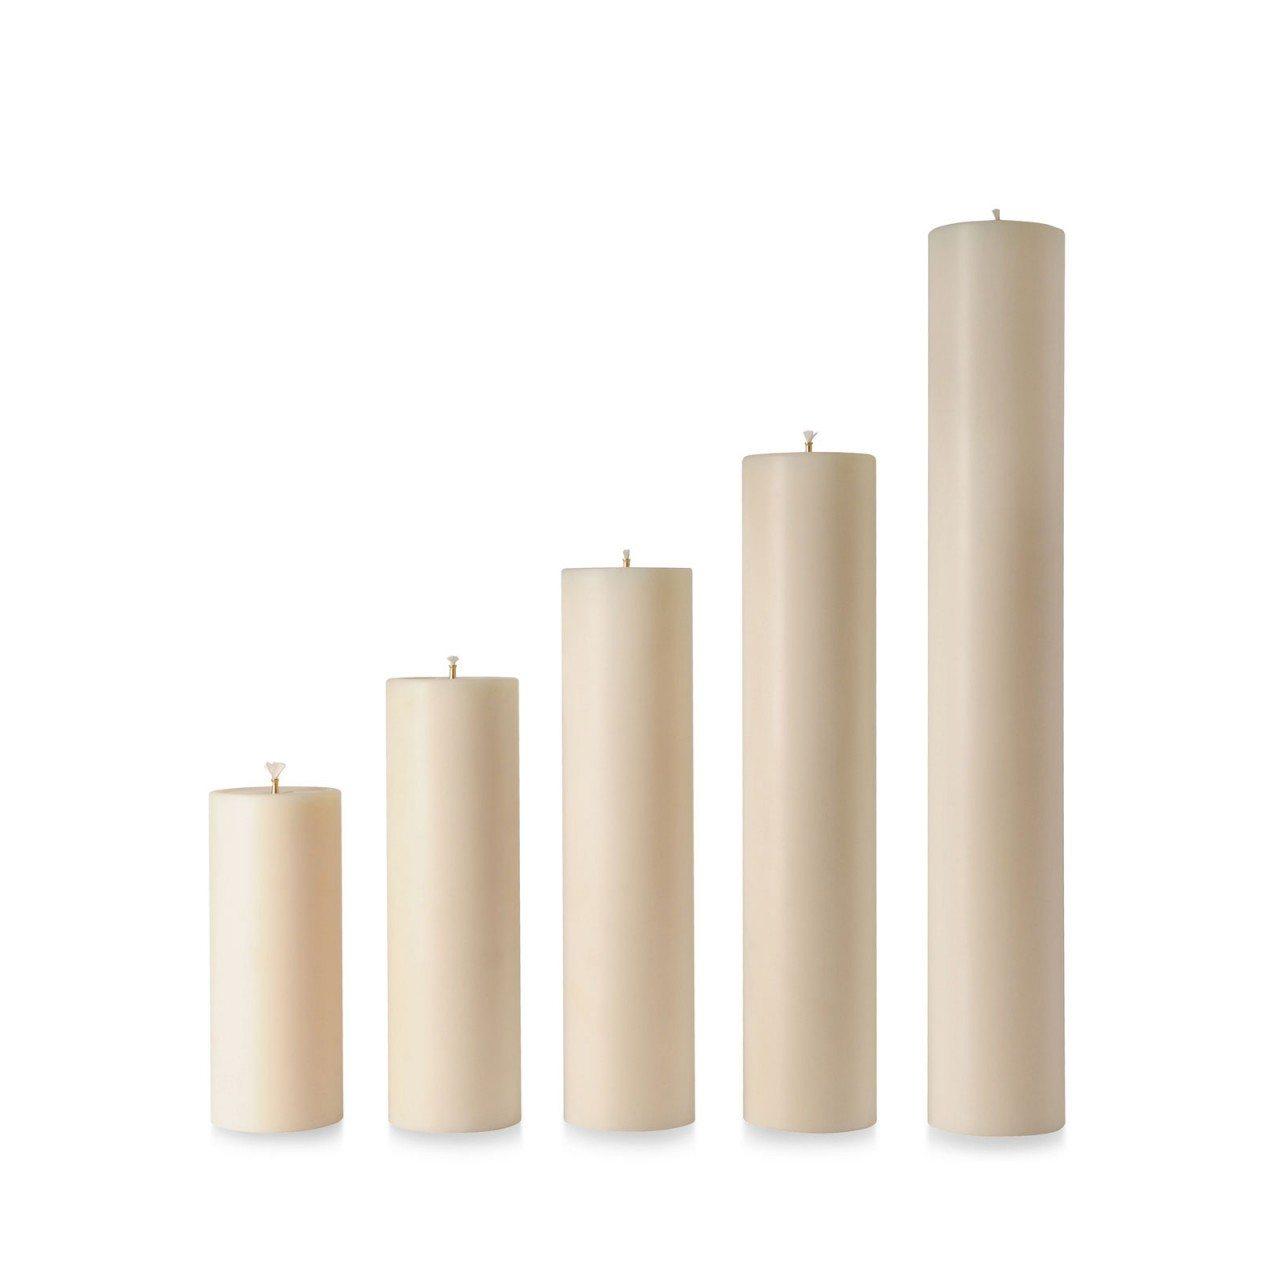 "36"" x 90mm Diameter Nylon Candle | Grace Church Supplies"